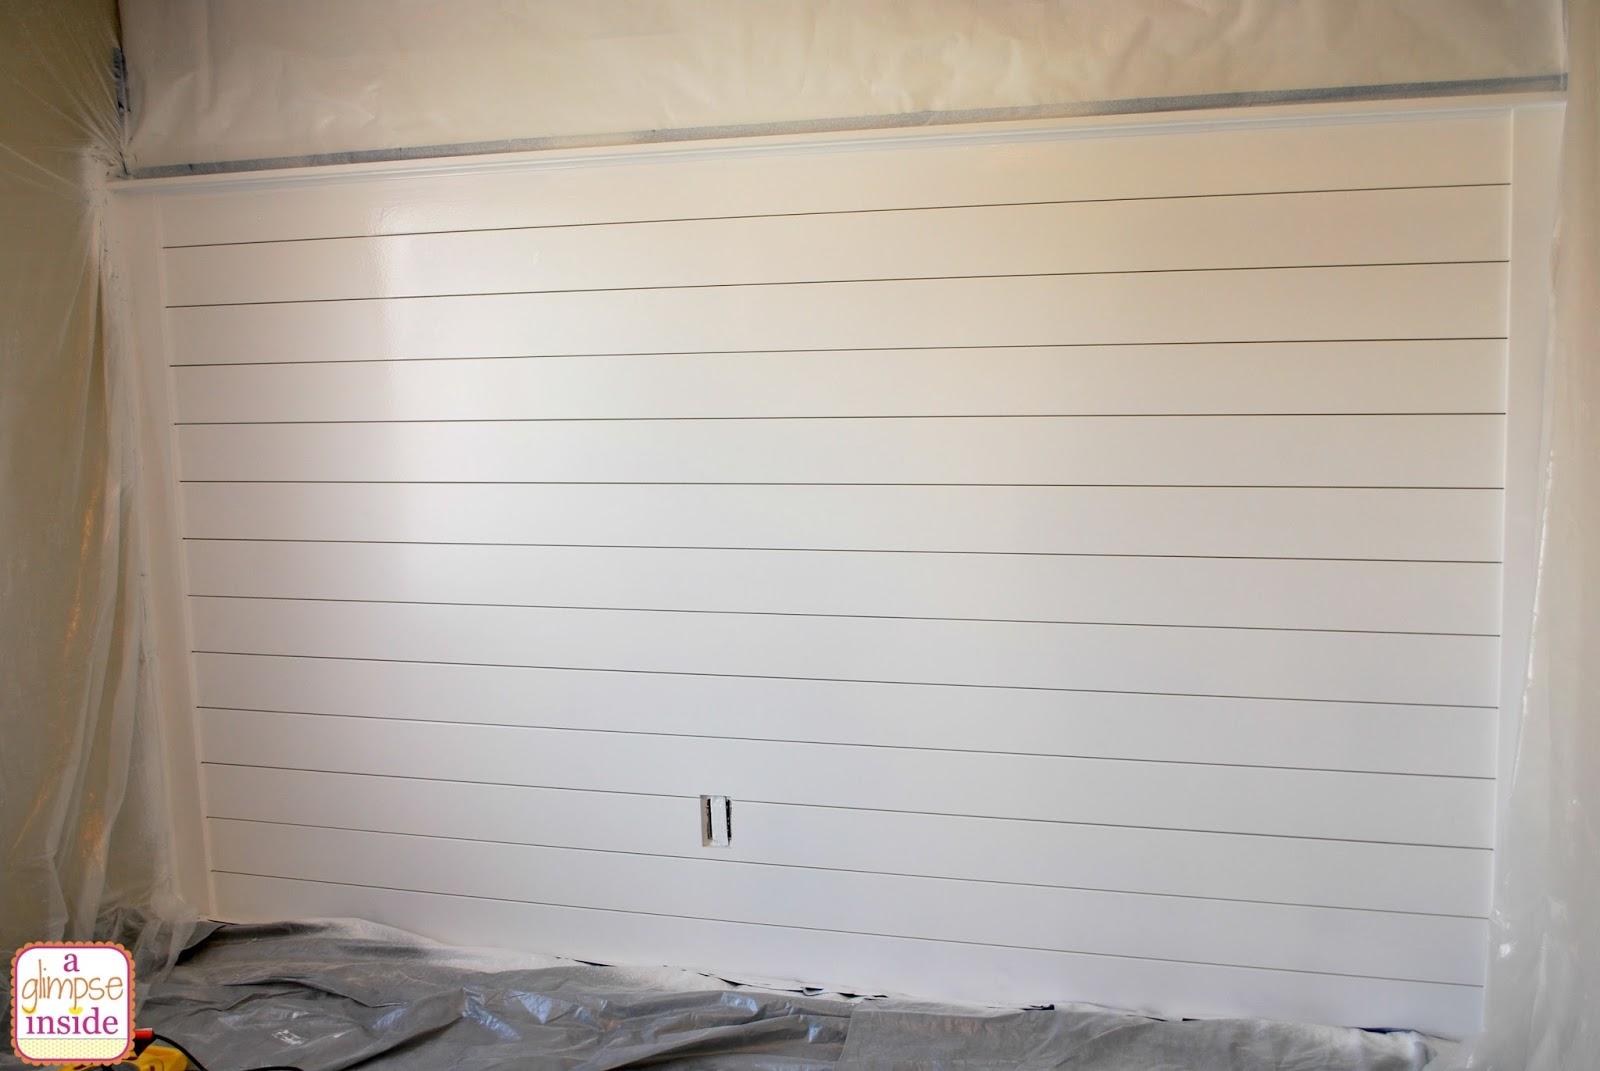 A Glimpse Inside Diy Plank Wall